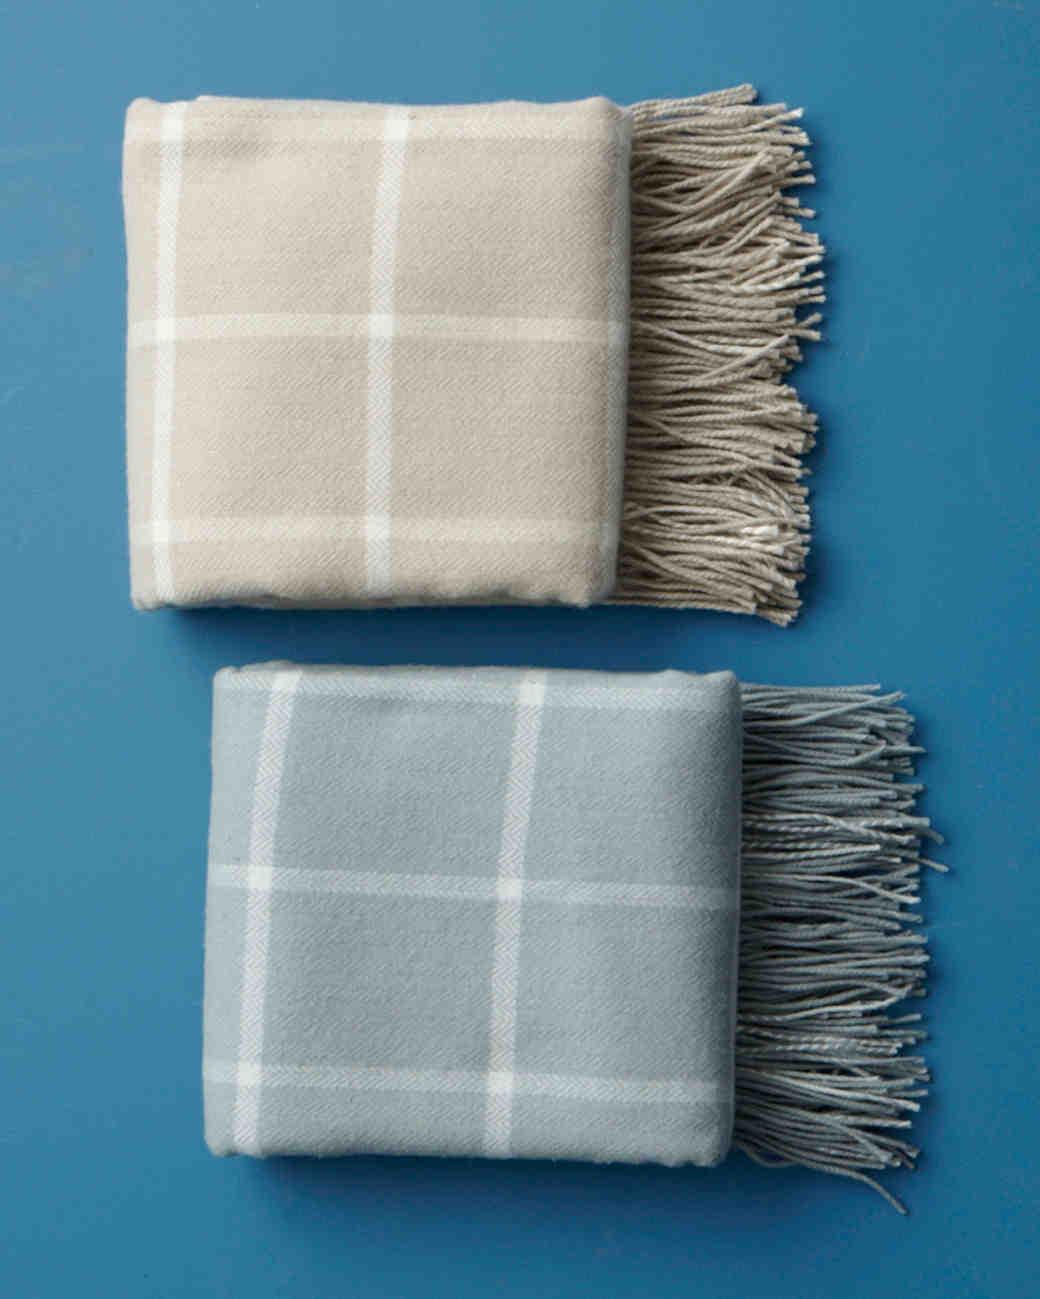 registry-gumps-blankets-001-wd108979.jpg